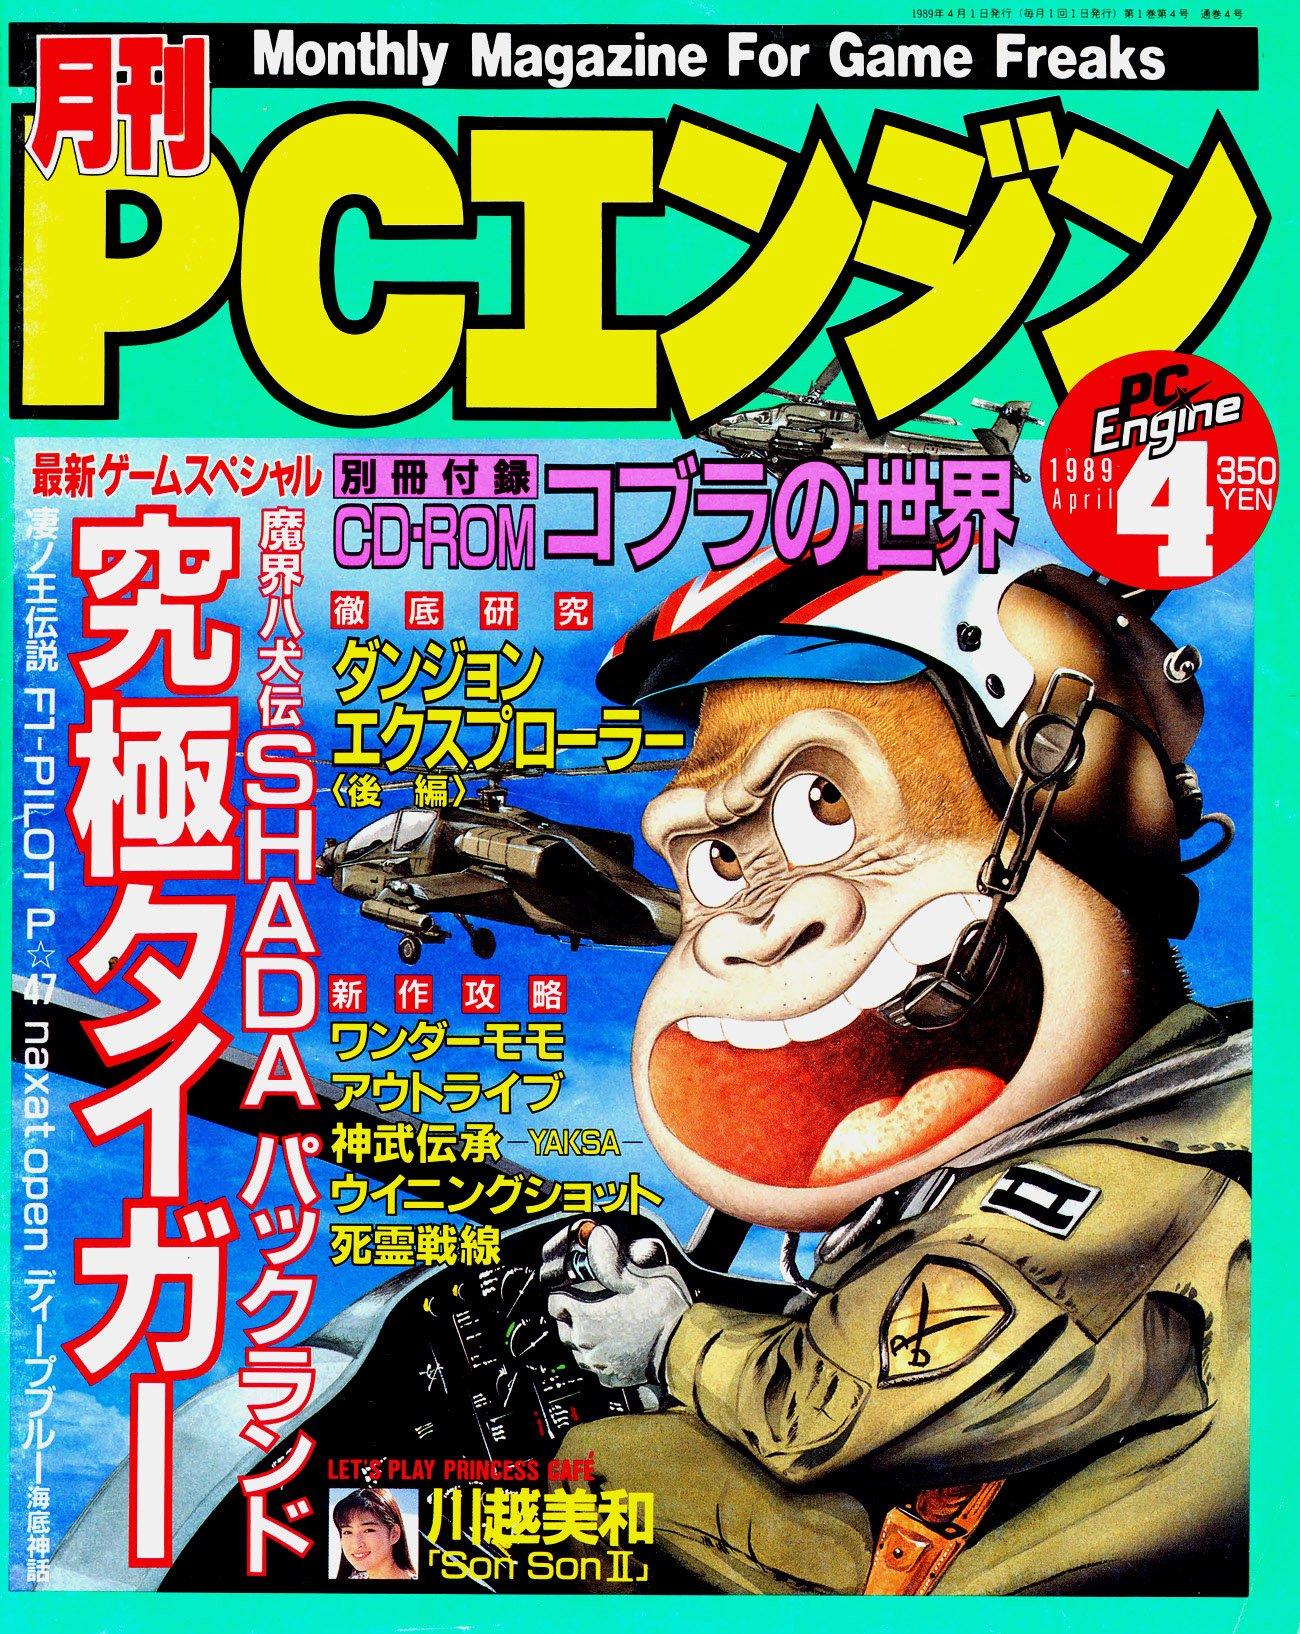 Gekkan PC Engine Issue 04 (April 1989)